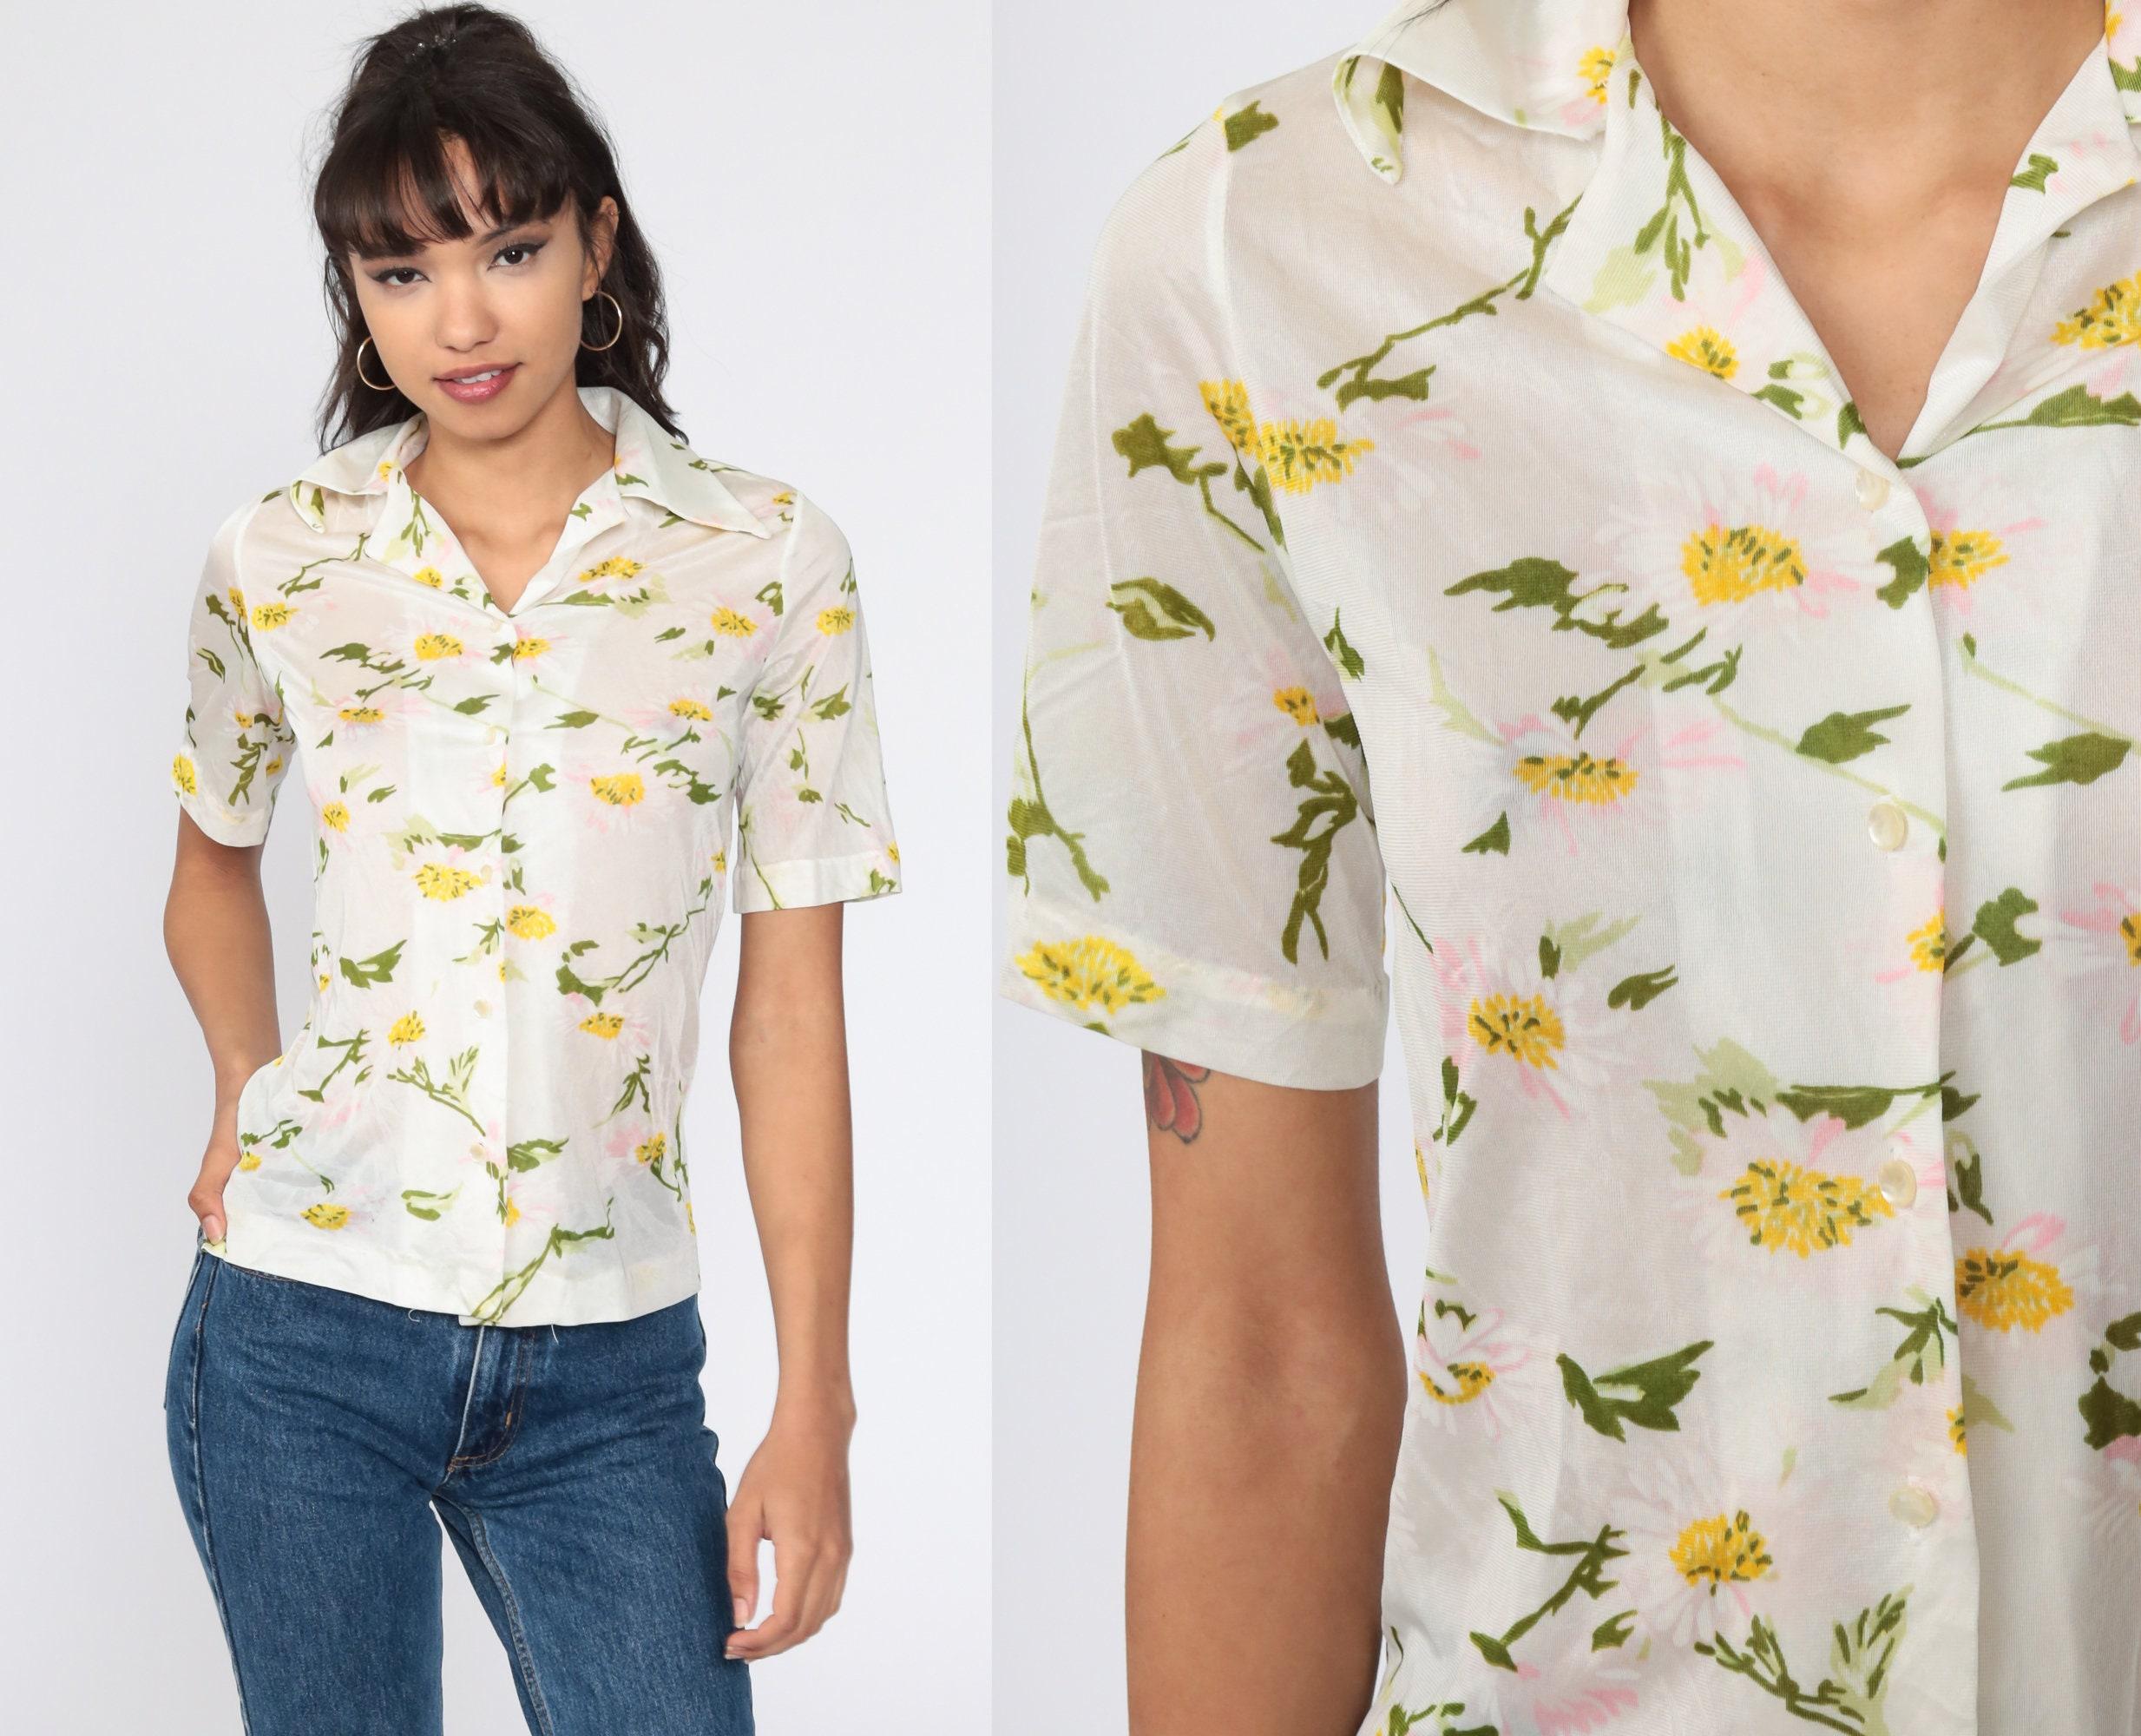 Medium . Vintage button front blouse floral print Small